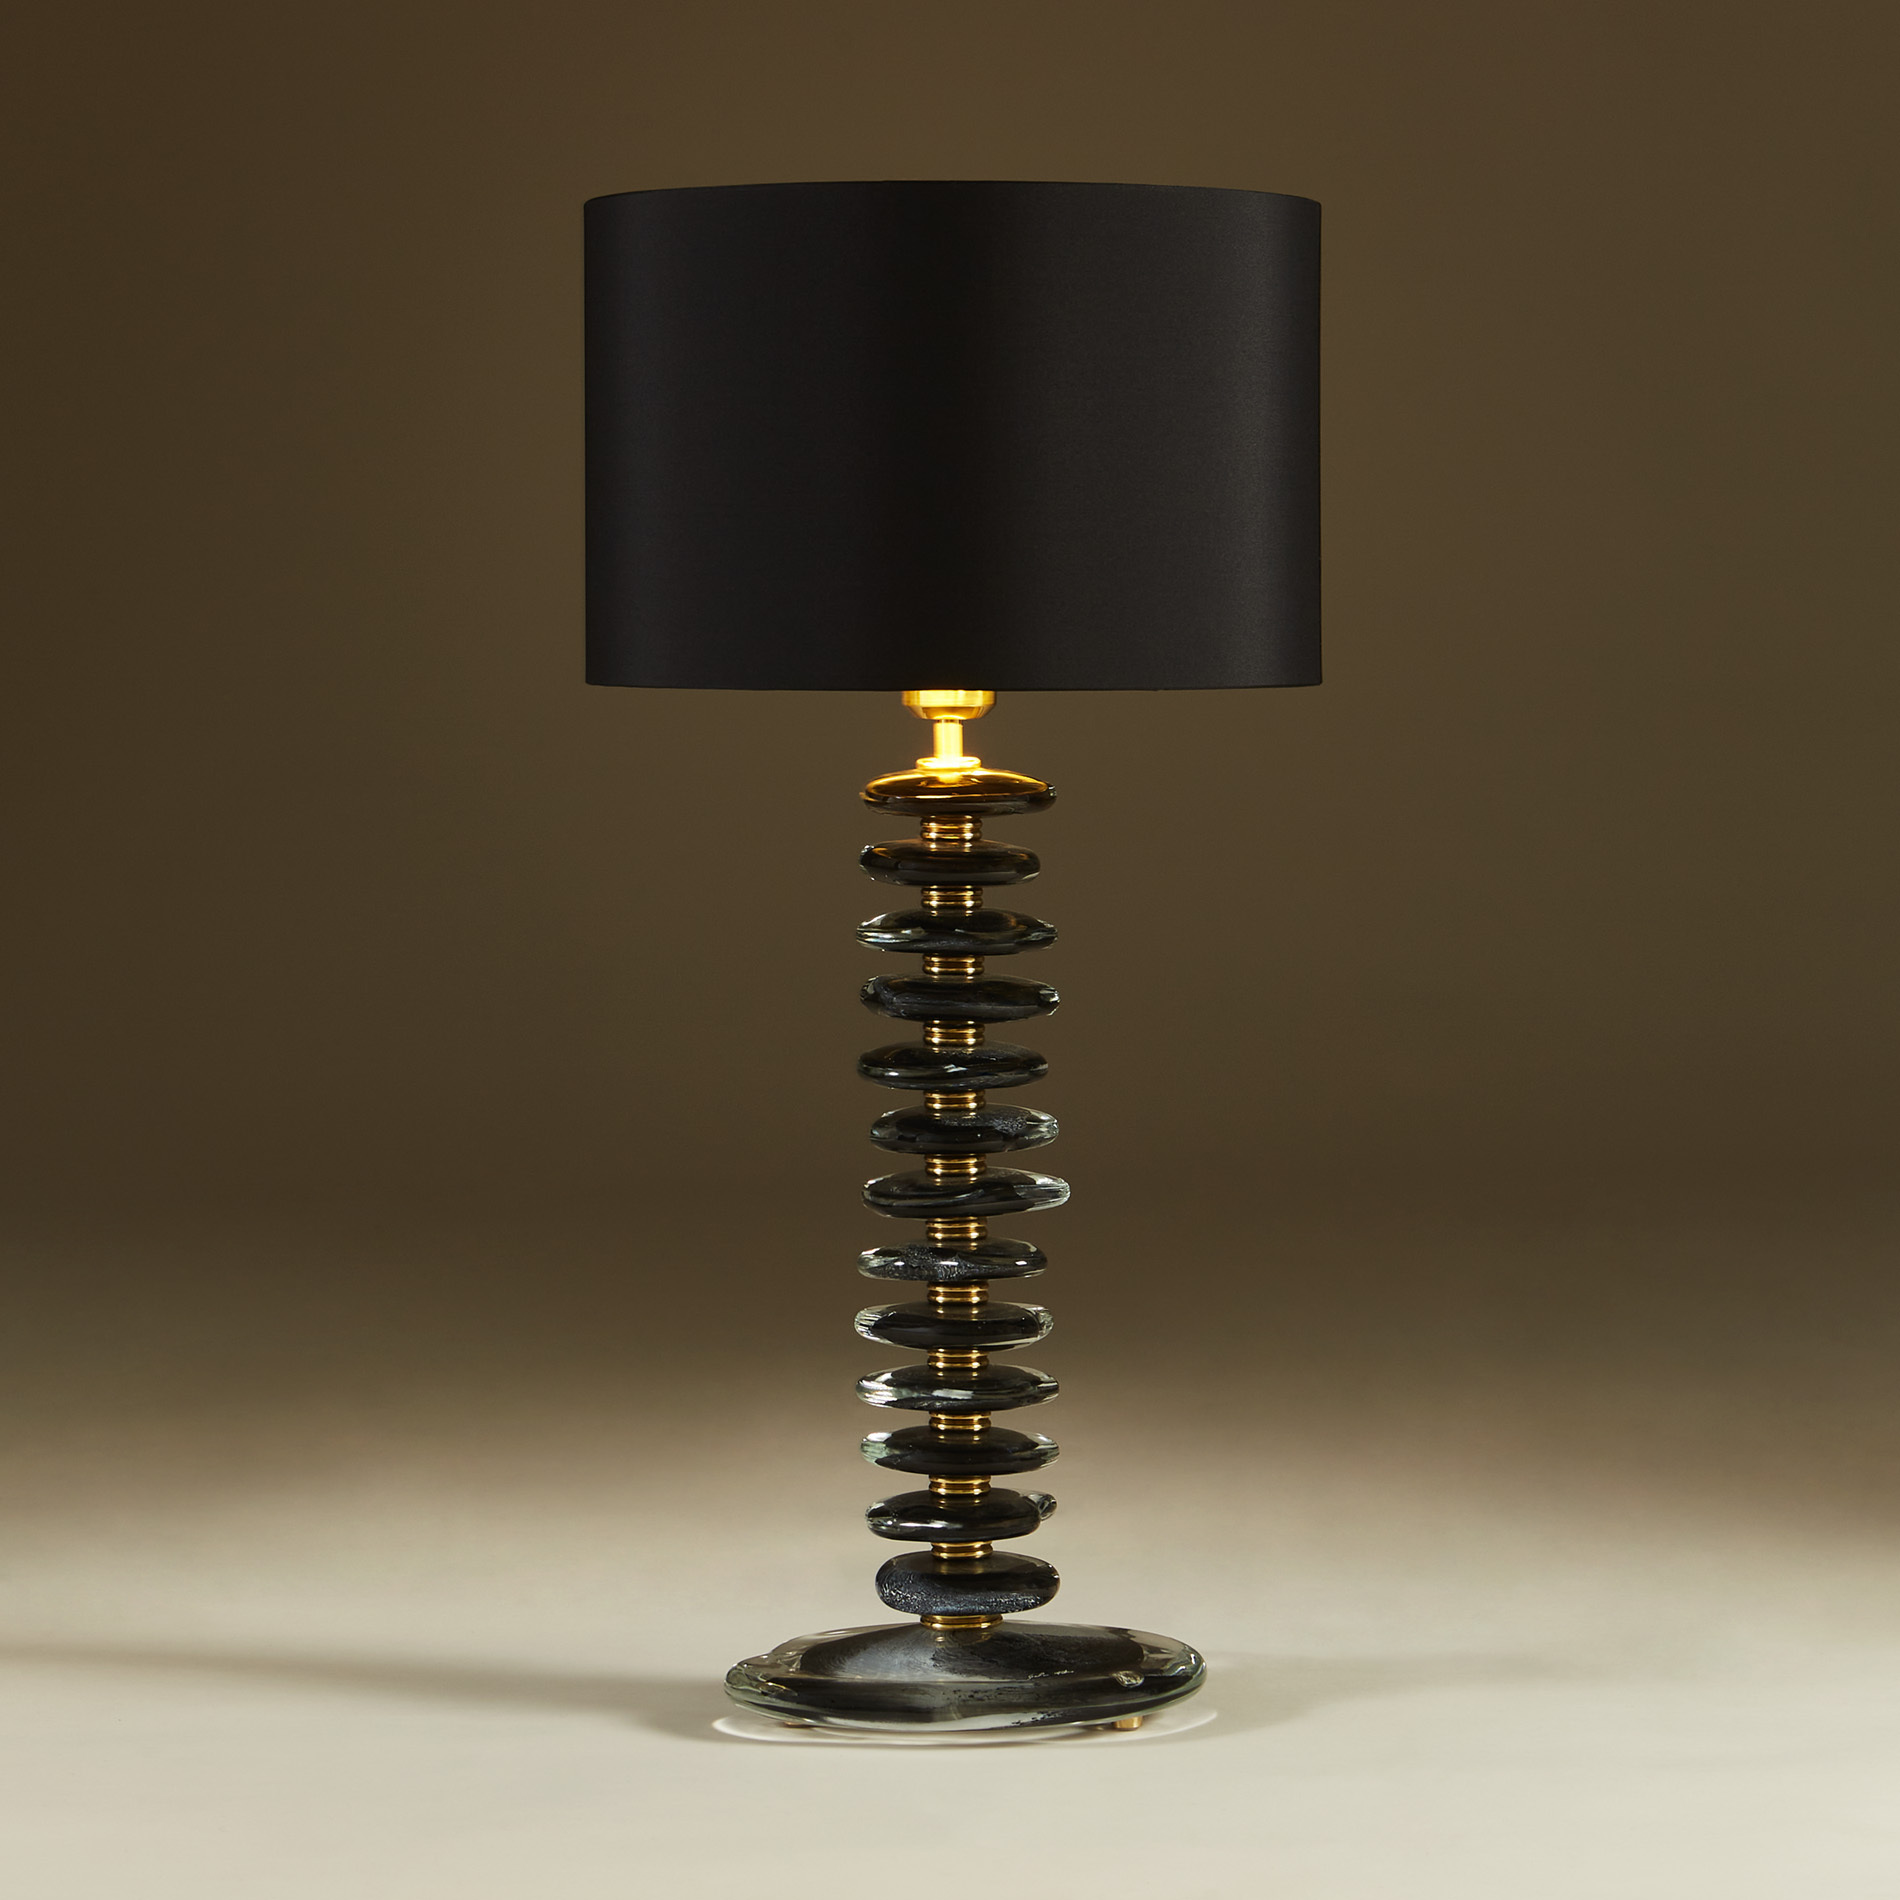 Black Murano Pebble Lamps 033 V1